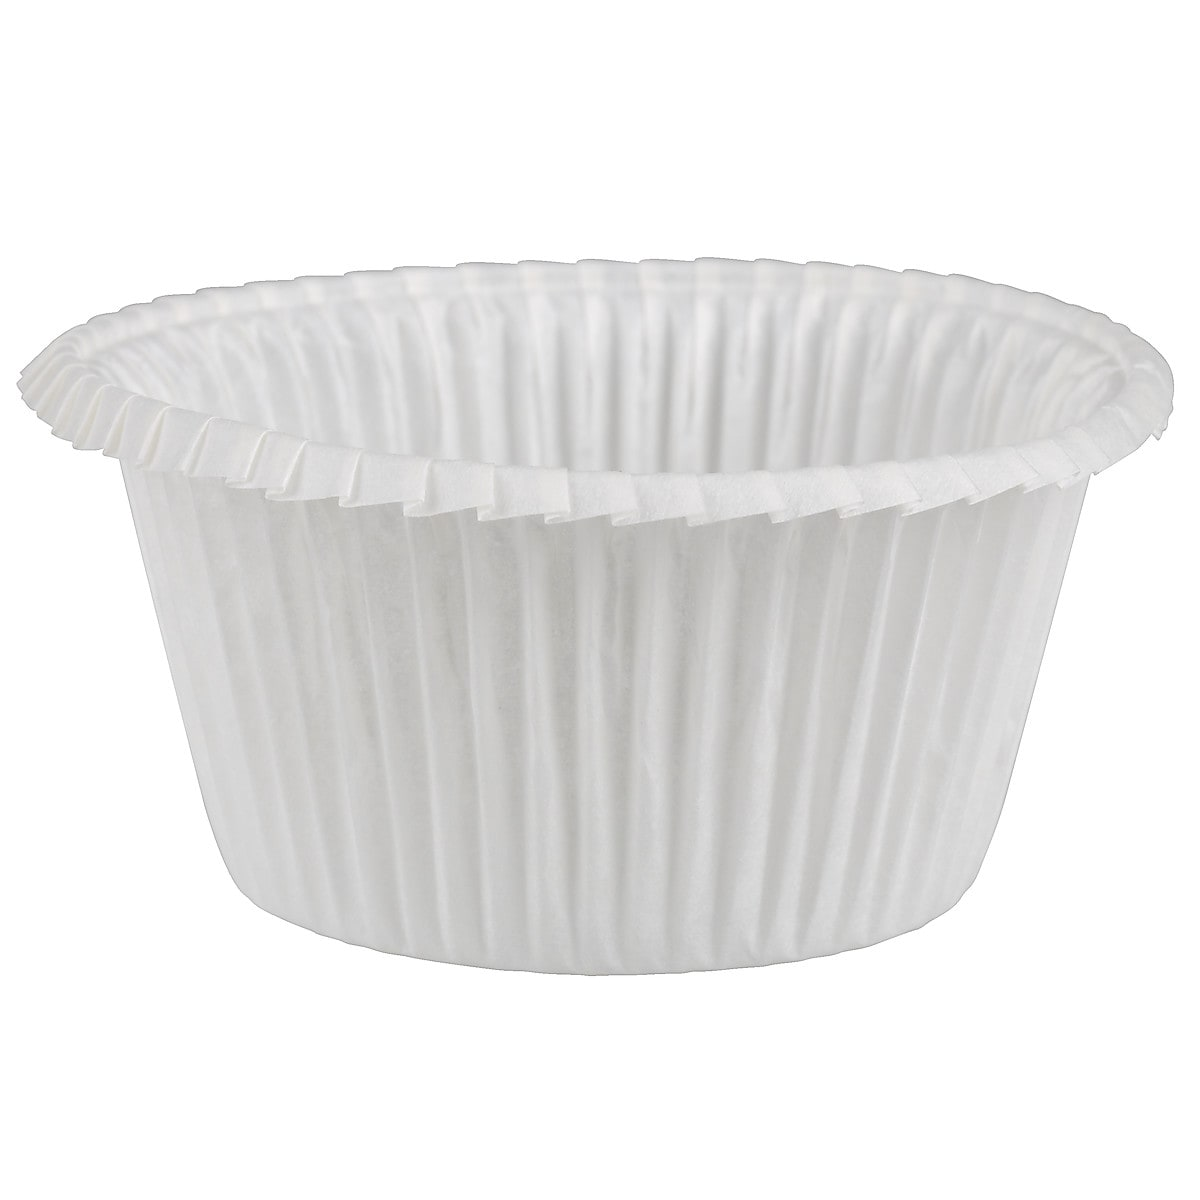 Muffinsformar 24-pack